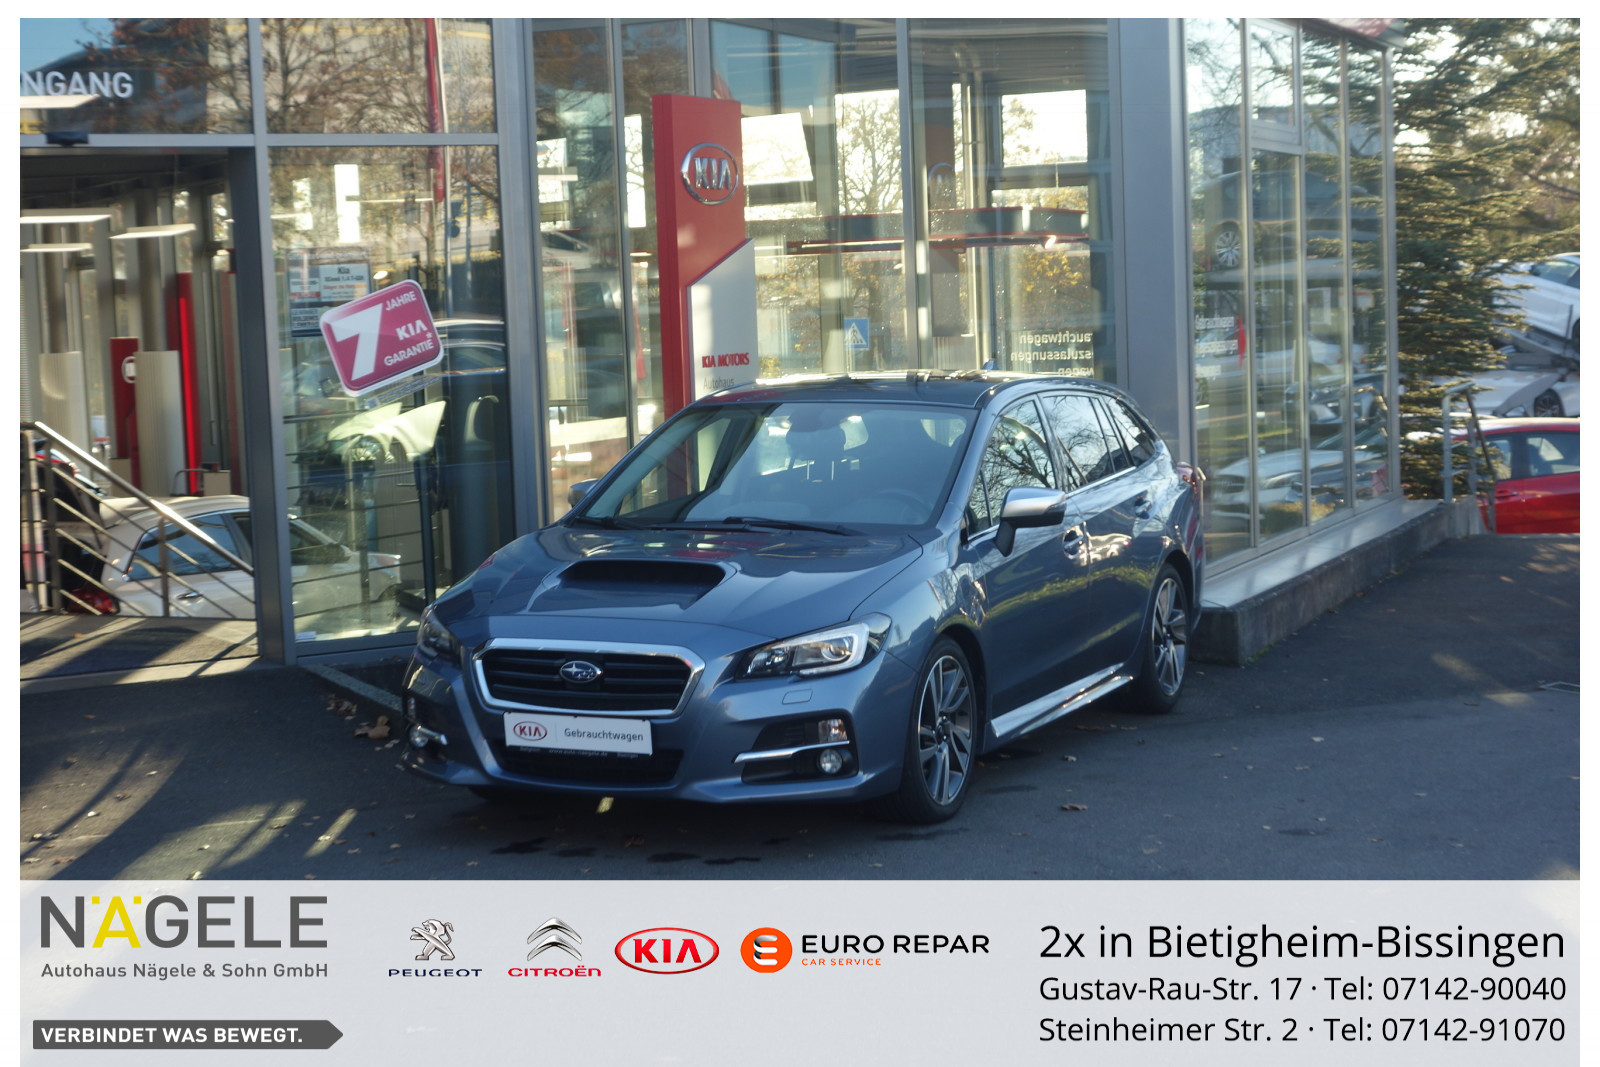 Subaru Levorg 1.6 Sport 4x4 Automatik|Navi|Klima| AHK, Jahr 2015, Benzin